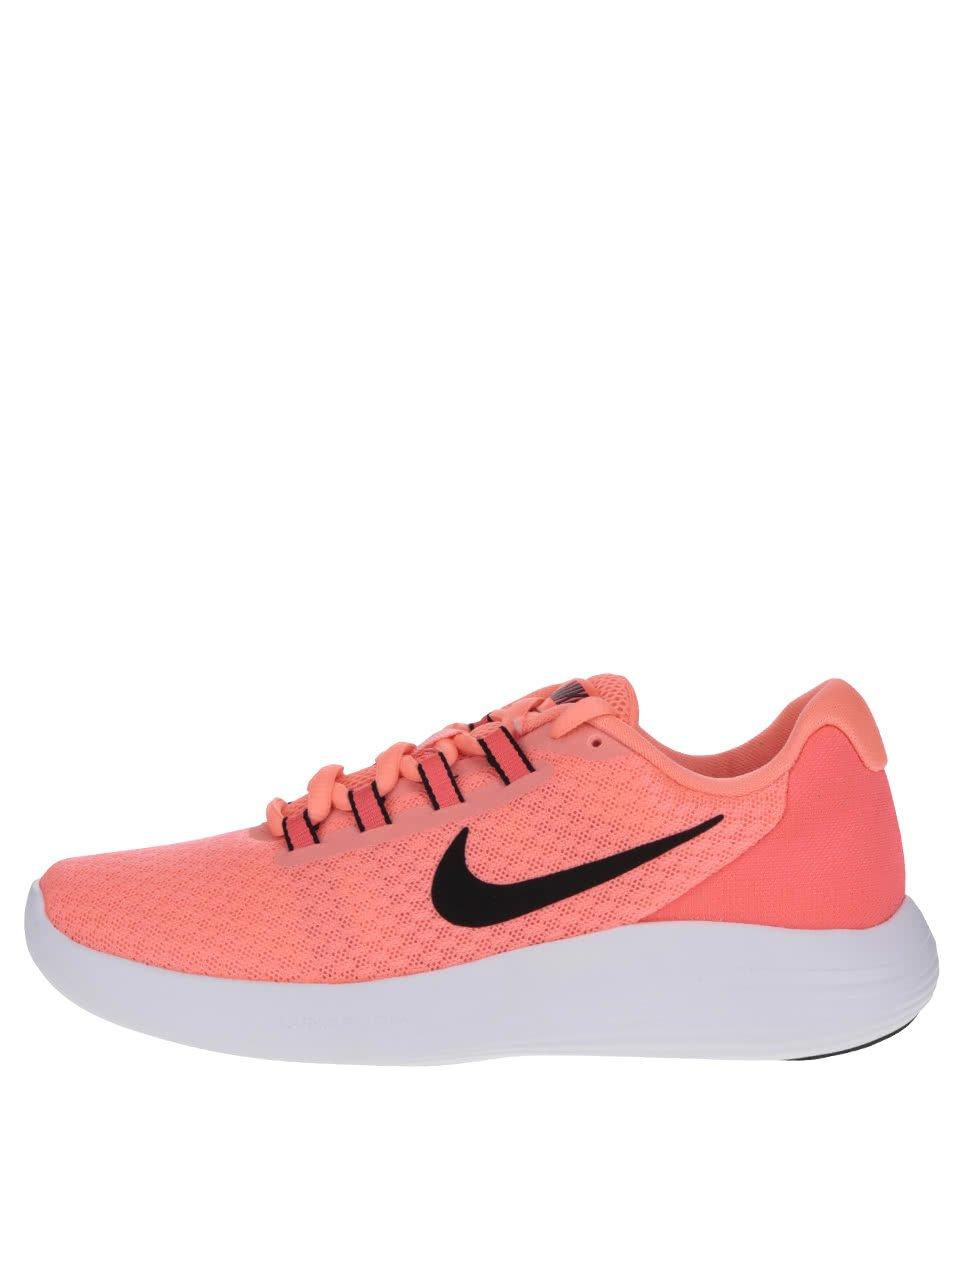 Růžové dámské tenisky Nike Lunar Converge